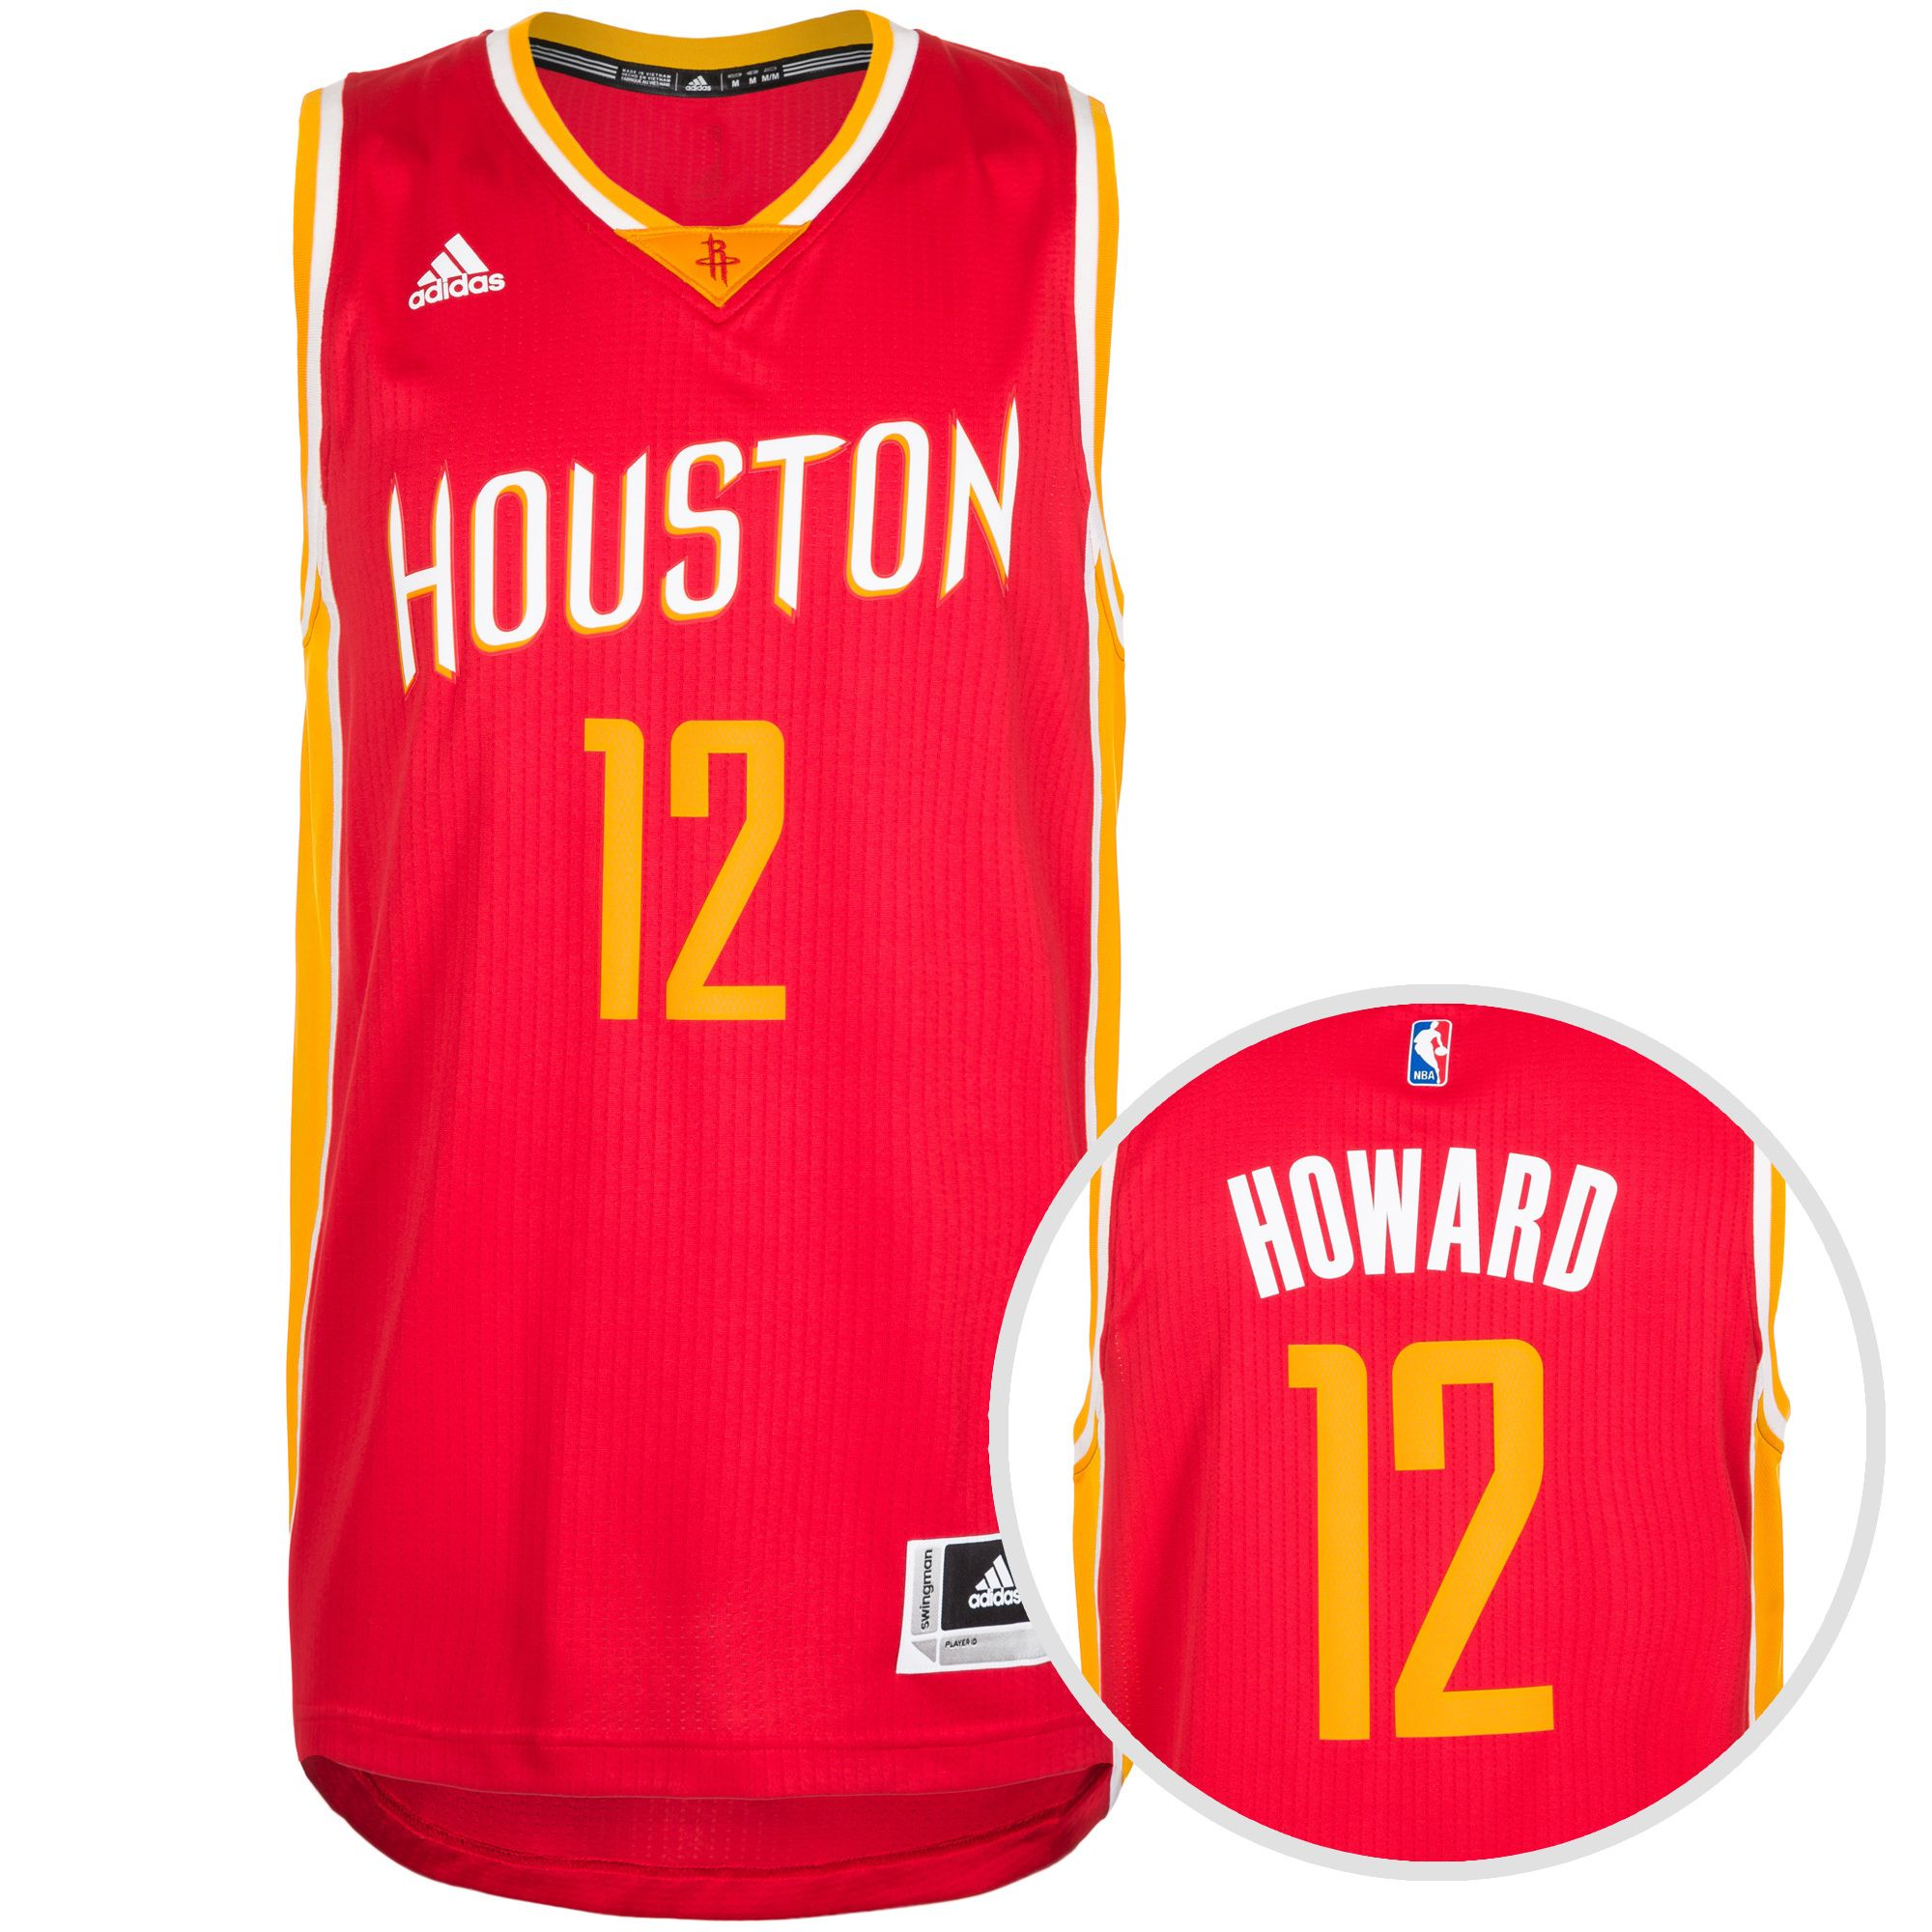 ADIDAS PERFORMANCE adidas Performance Houston Rockets Howard Swingman Basketballtrikot Herren